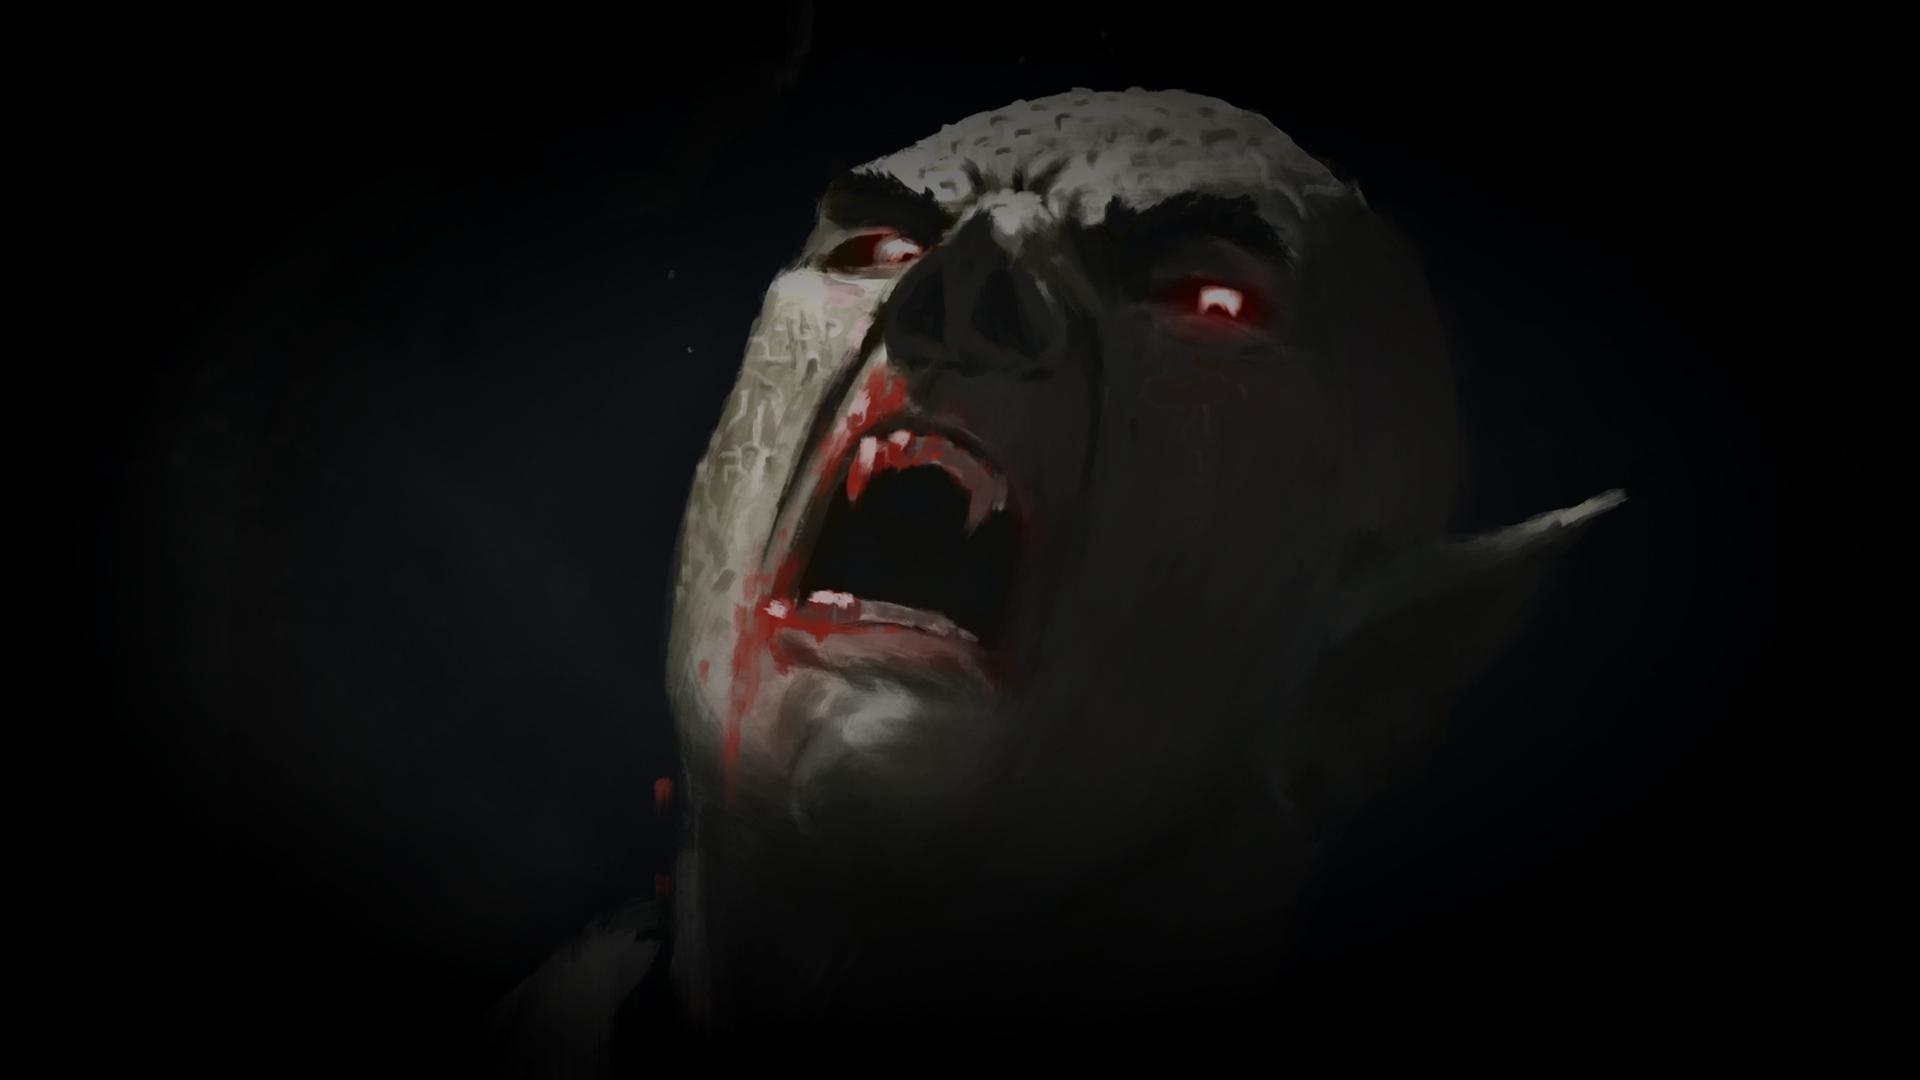 490980-Vampire (Profile Background)